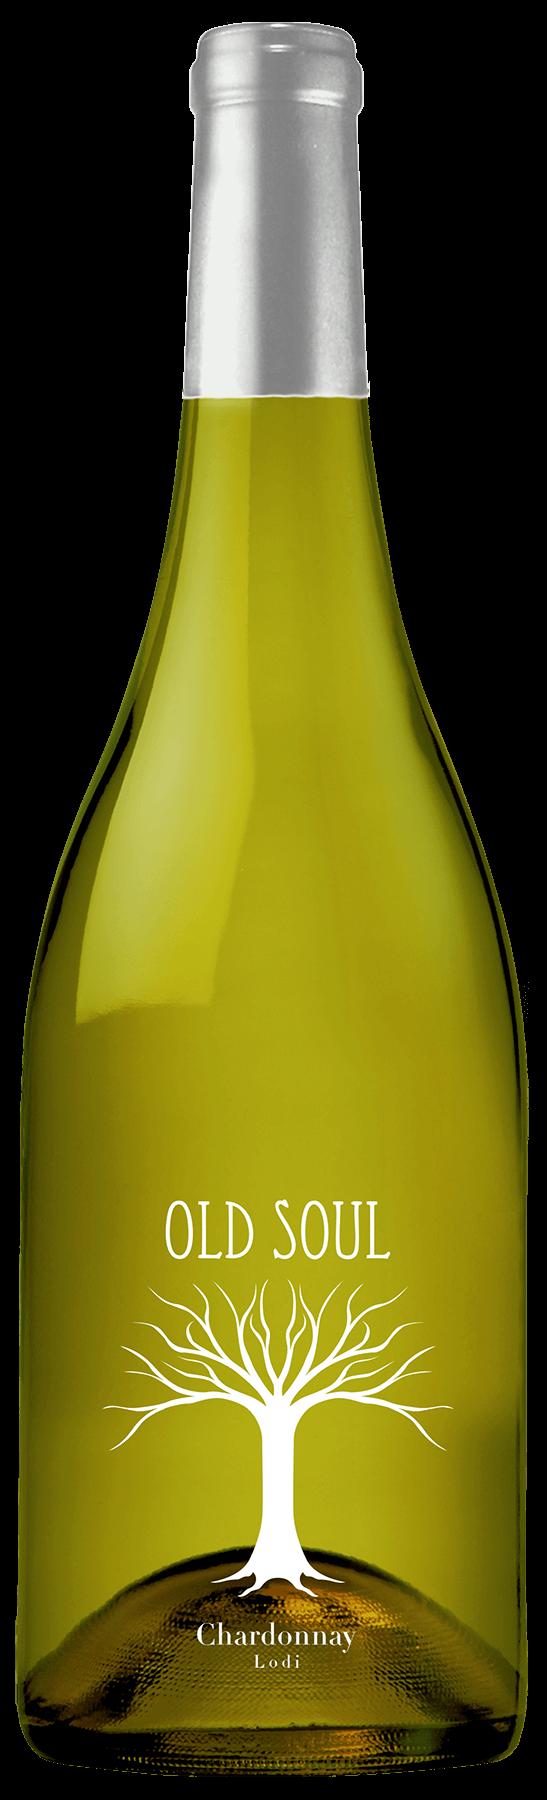 2017 Old Soul Chardonnay 750ml